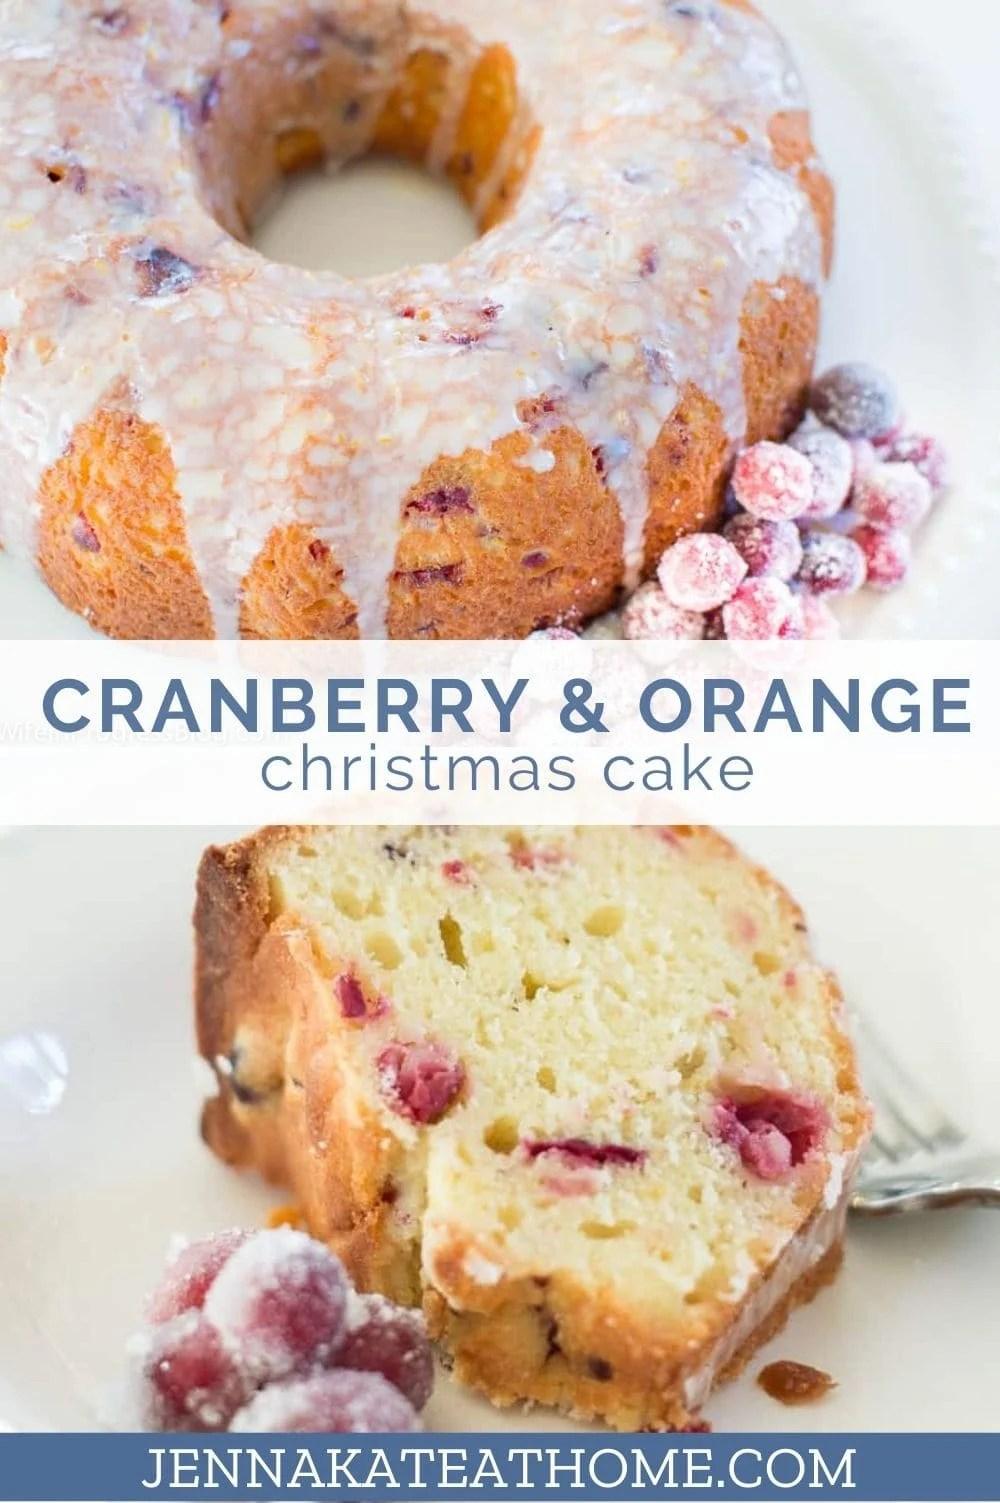 cranberry orange Christmas cake